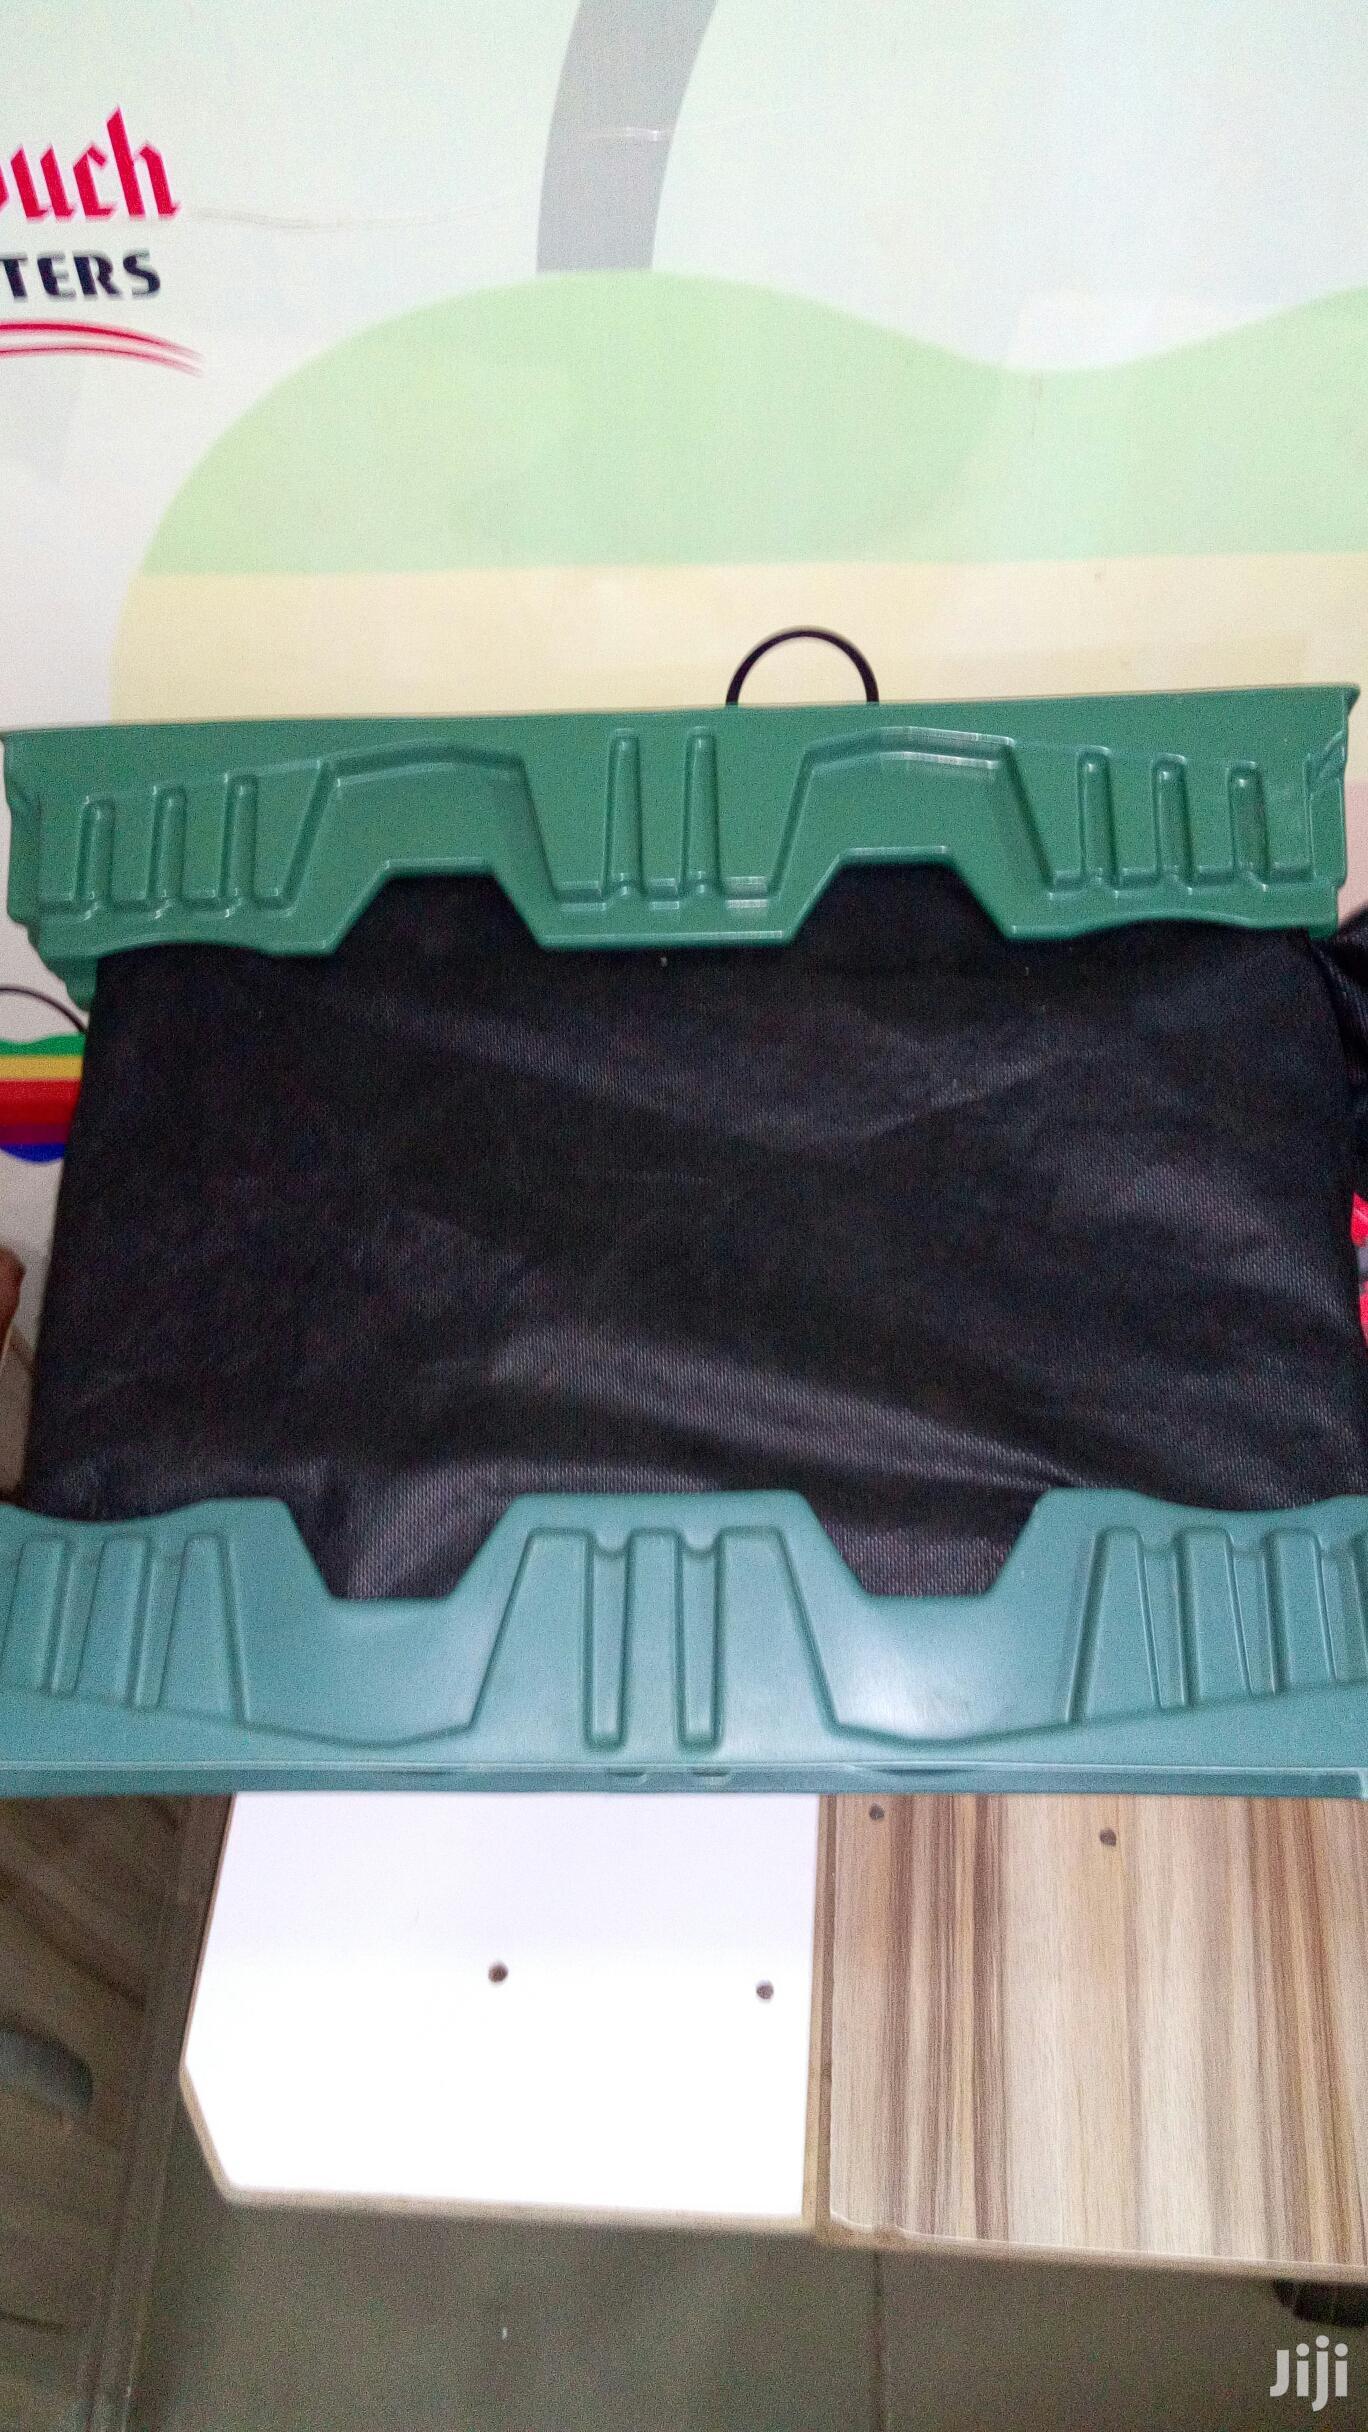 Laptop Lenovo ThinkPad E570 8GB Intel Core I5 SSD 500GB | Laptops & Computers for sale in Wuse, Abuja (FCT) State, Nigeria